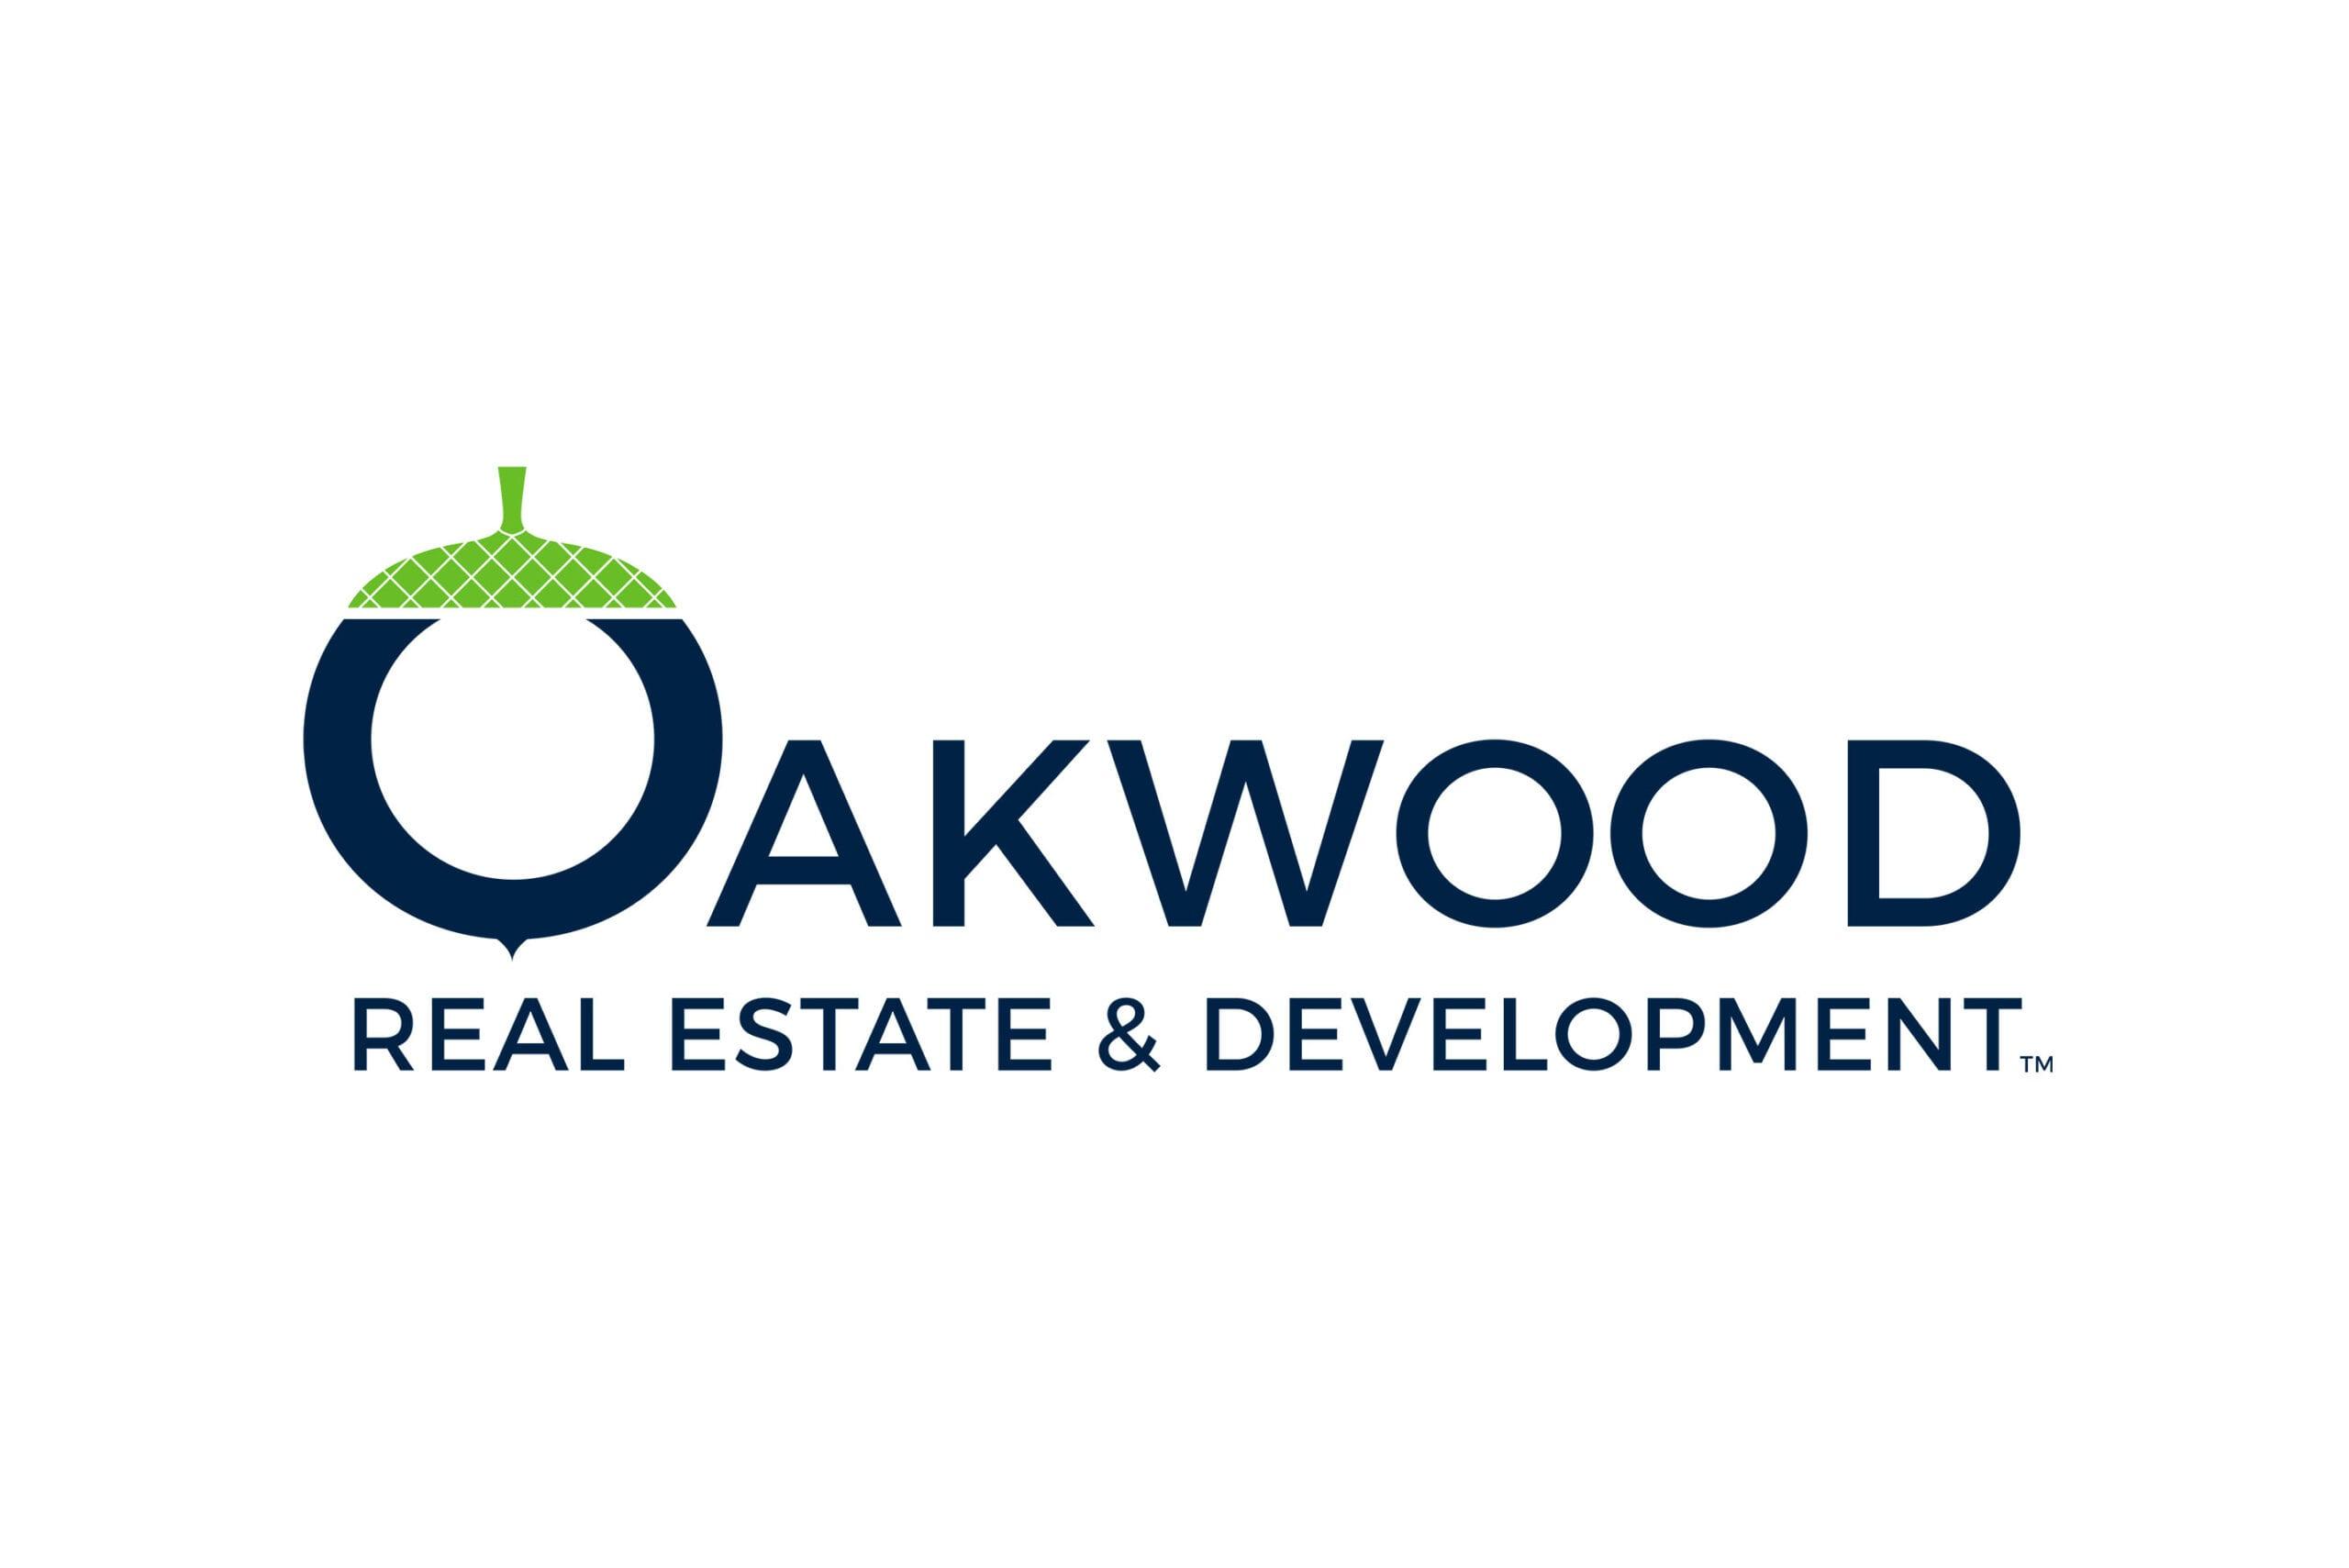 Oakwood Real Estate and Development Logo